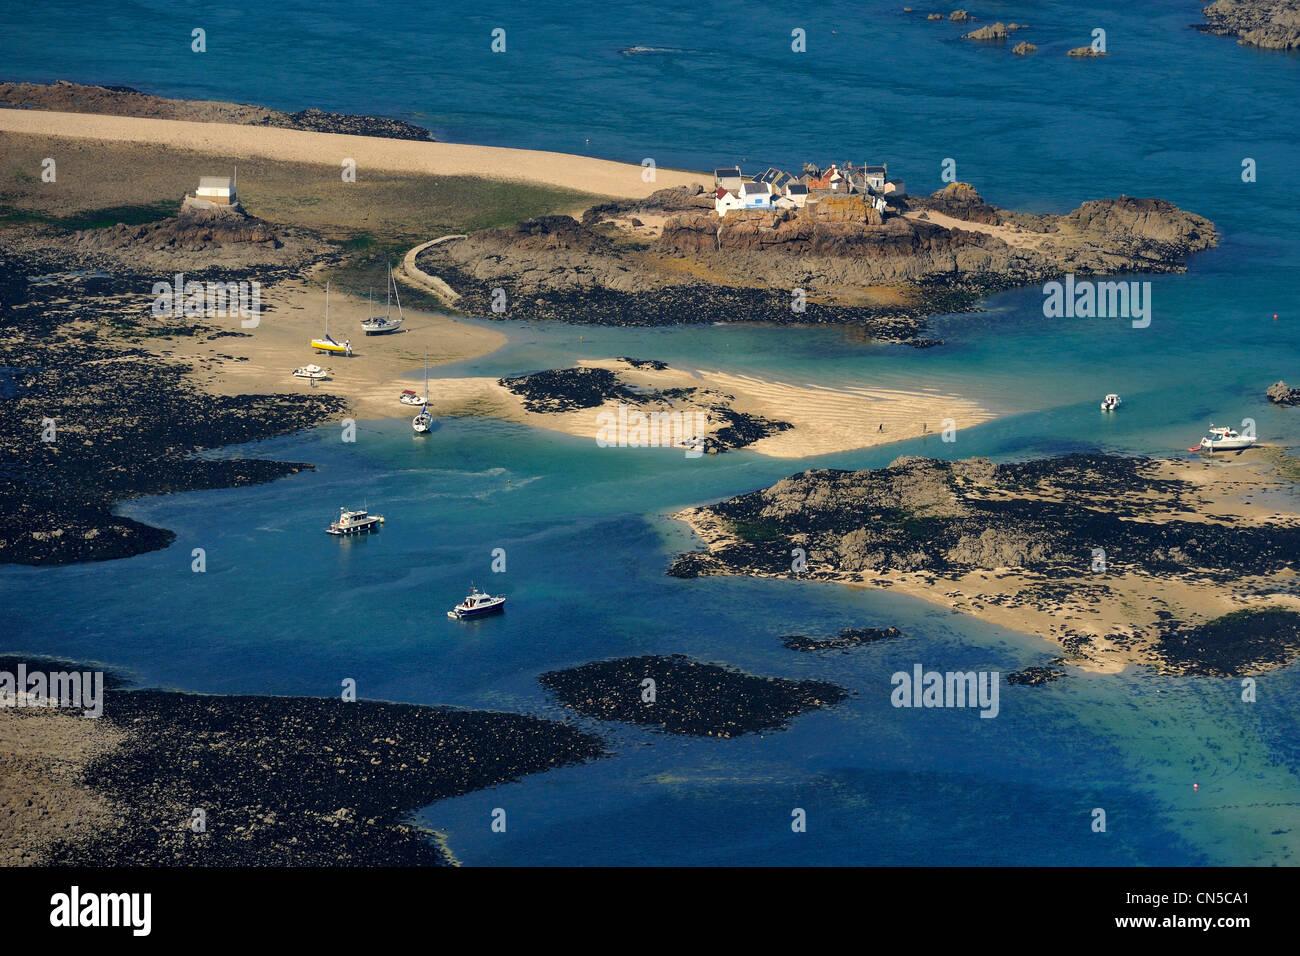 United Kingdom, Channel islands, Jersey island, the Ecrehou islands at low tide, fishermen's houses Stock Photo